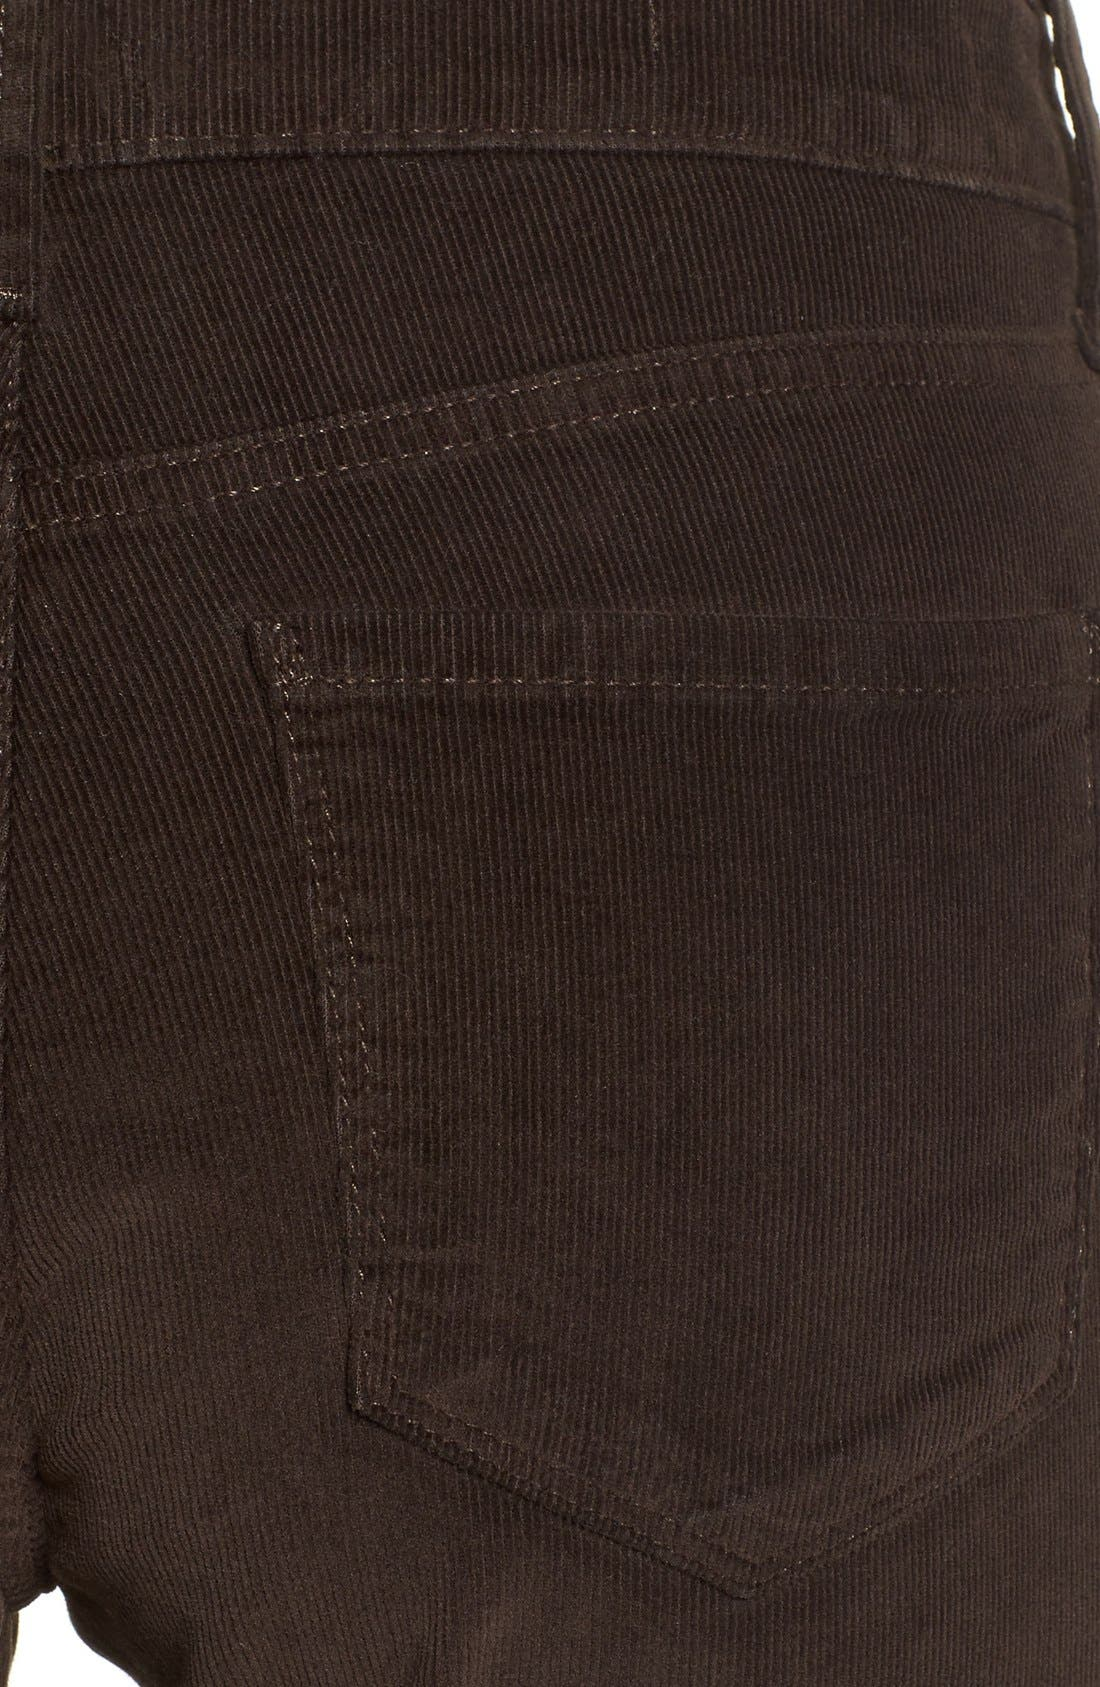 Alternate Image 4  - NYDJ 'Alina' Skinny Stretch Corduroy Pants (Regular & Petite)